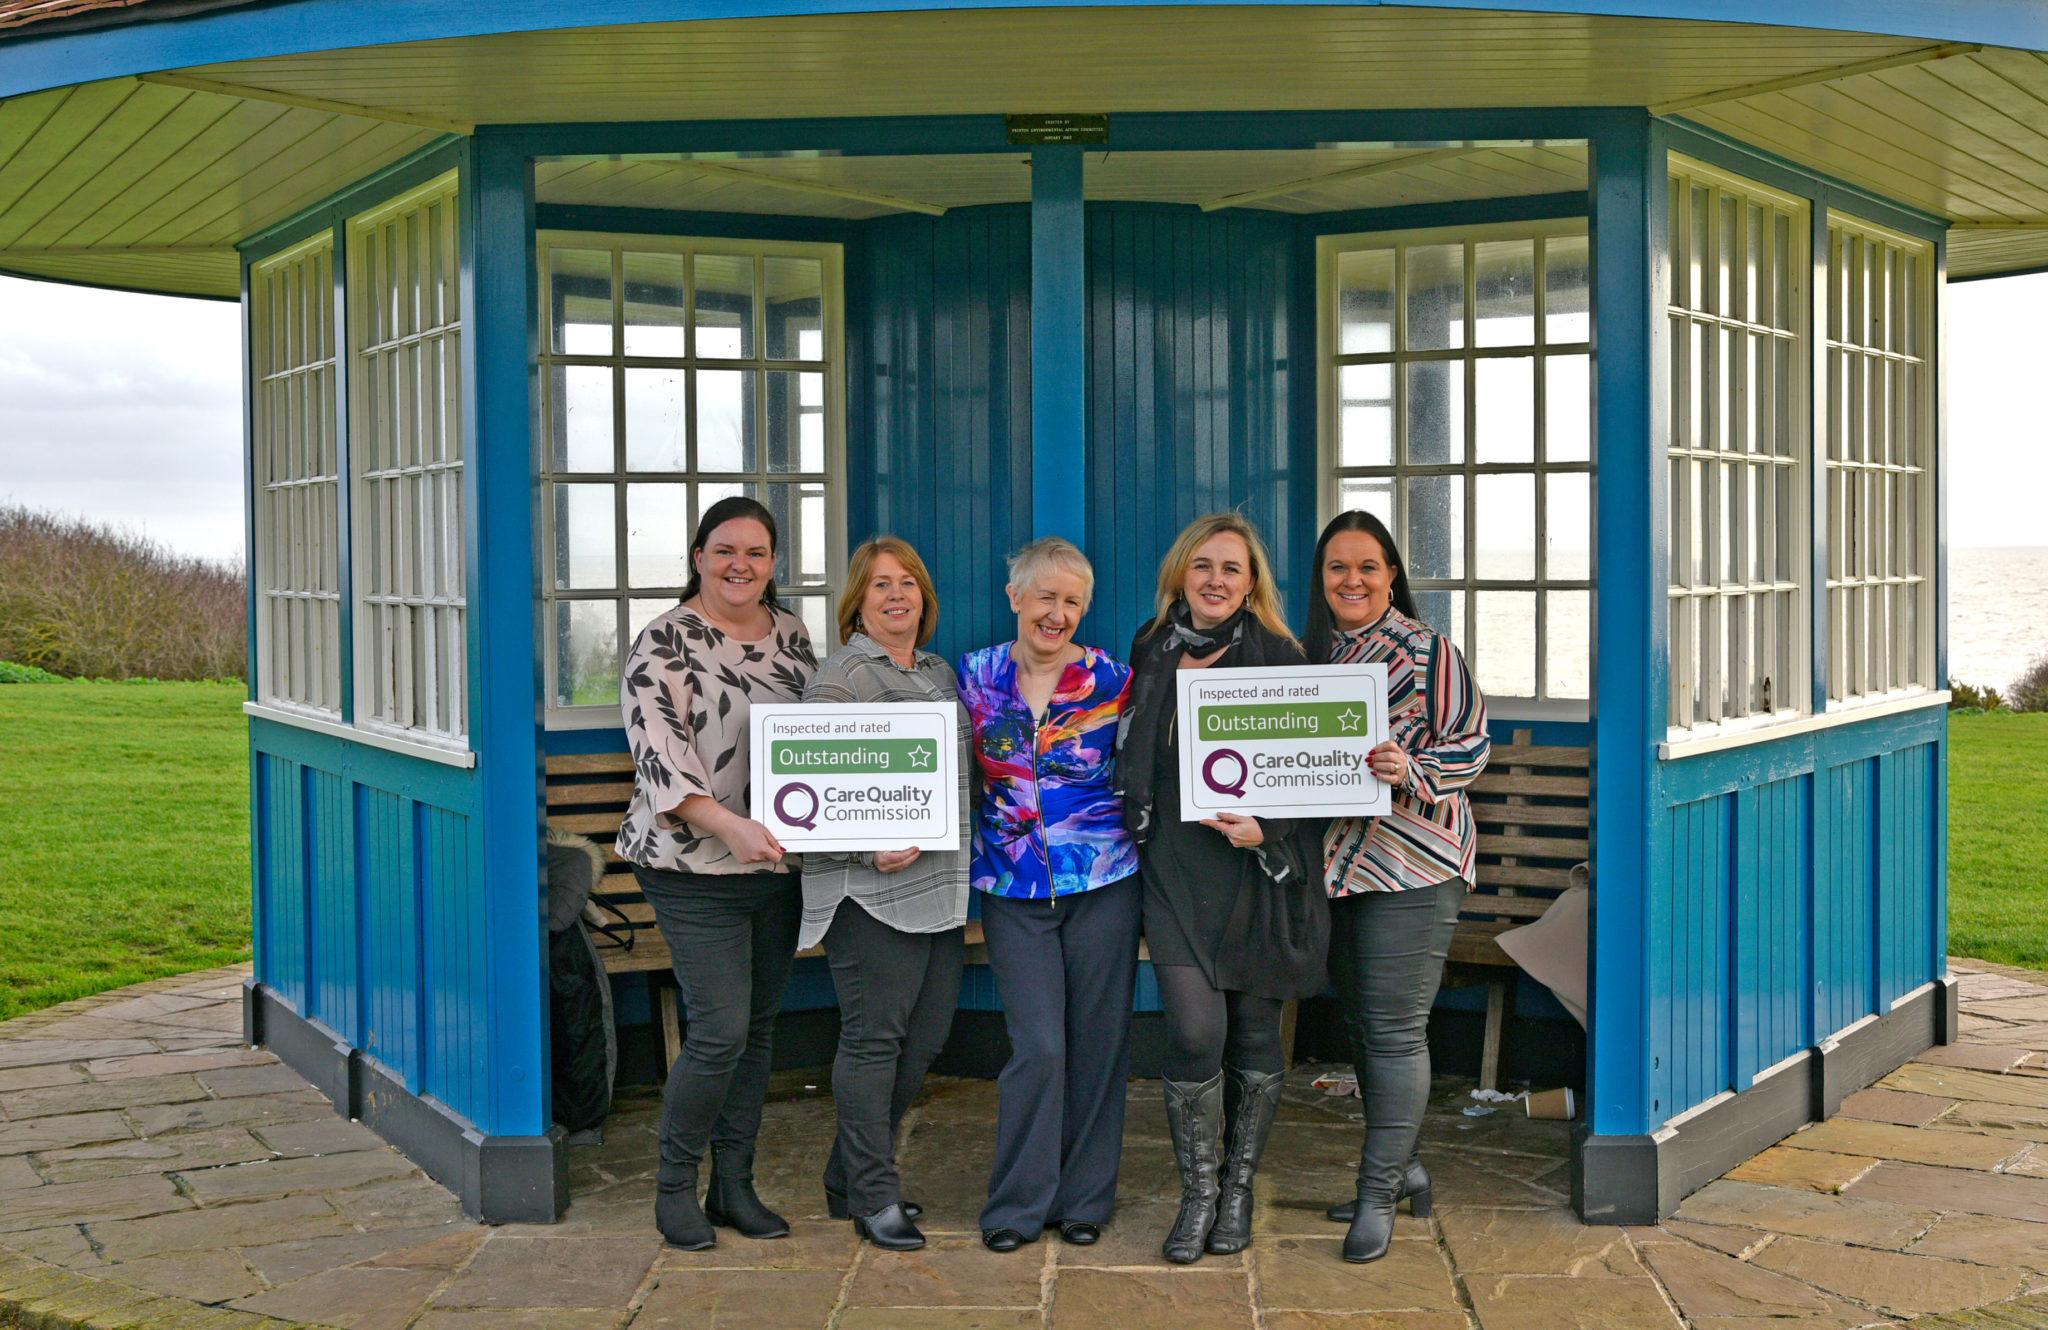 Outstanding Award team photo on Greensward 2 Frinton 2020-3680×2390